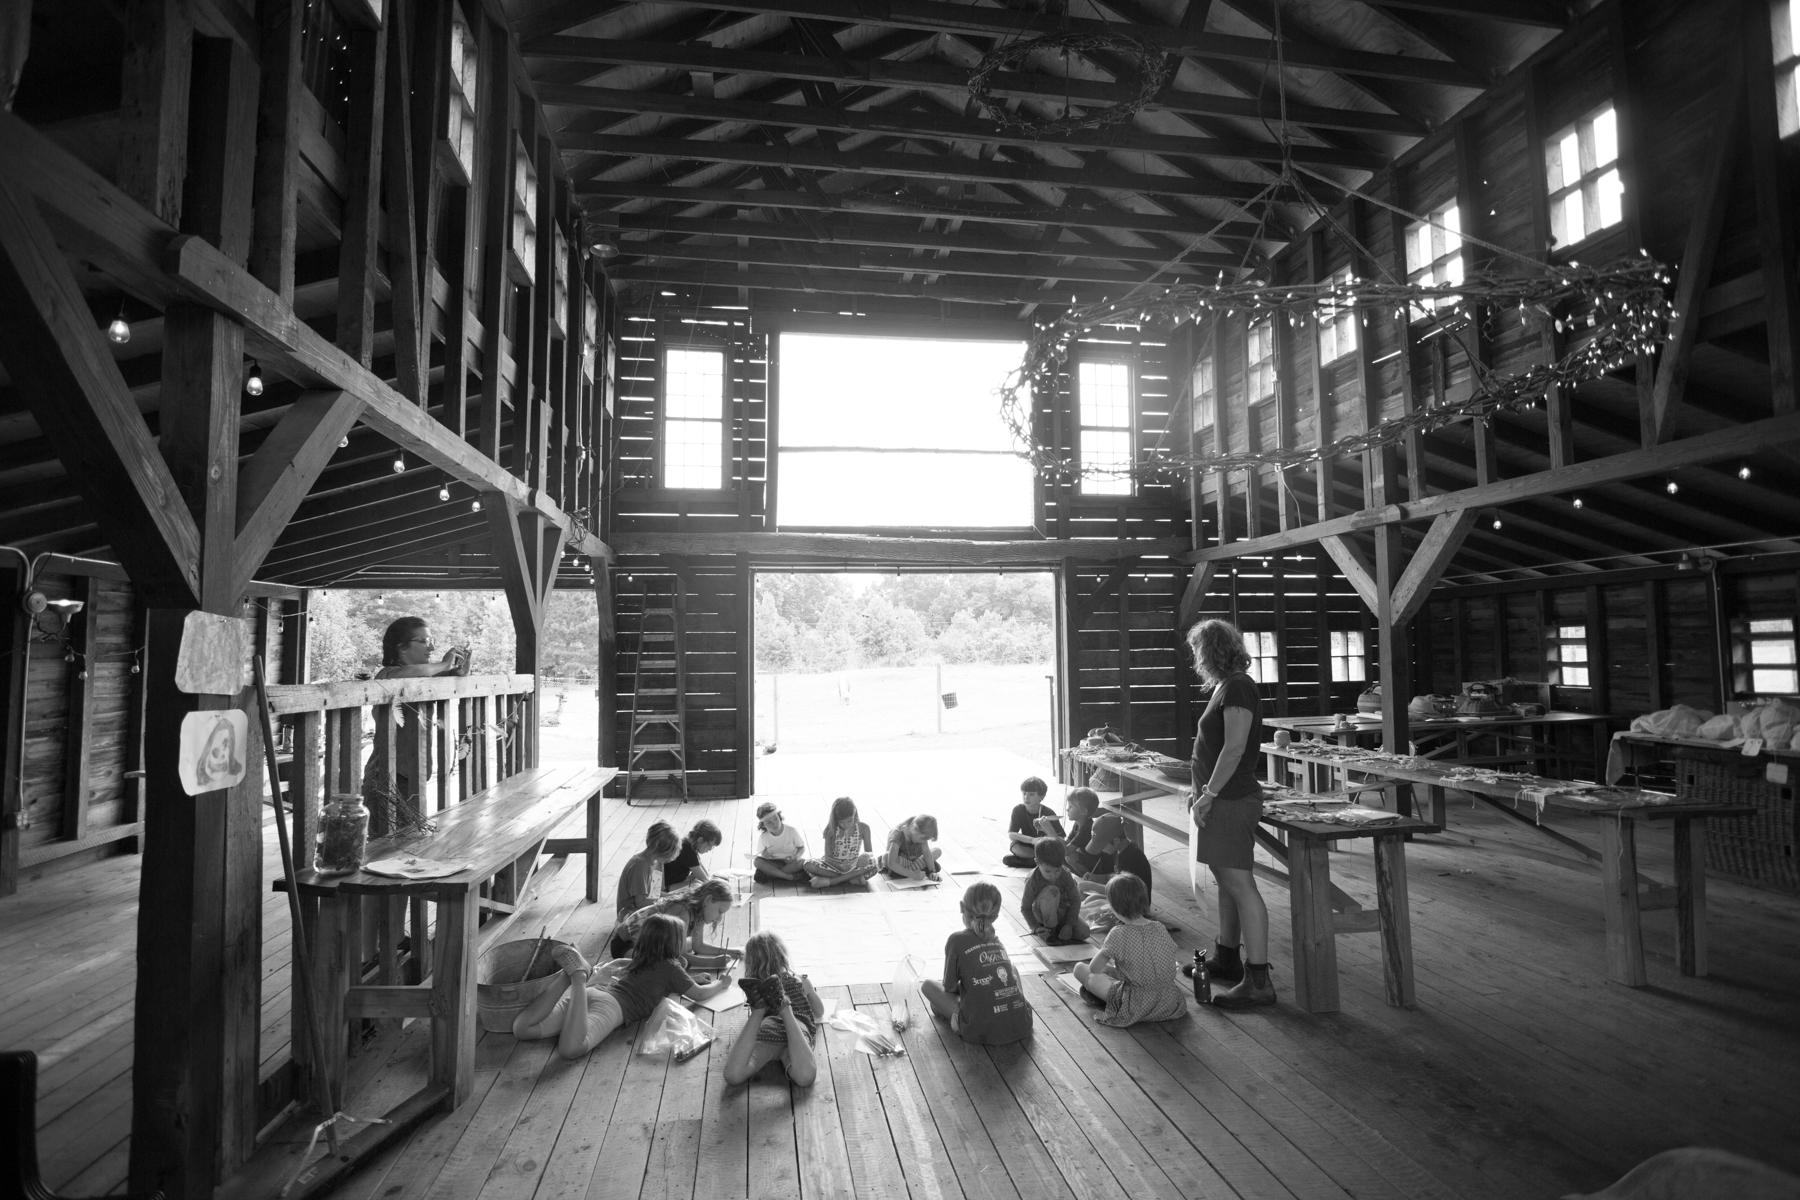 RA_story of the land camp-201607018240.jpg